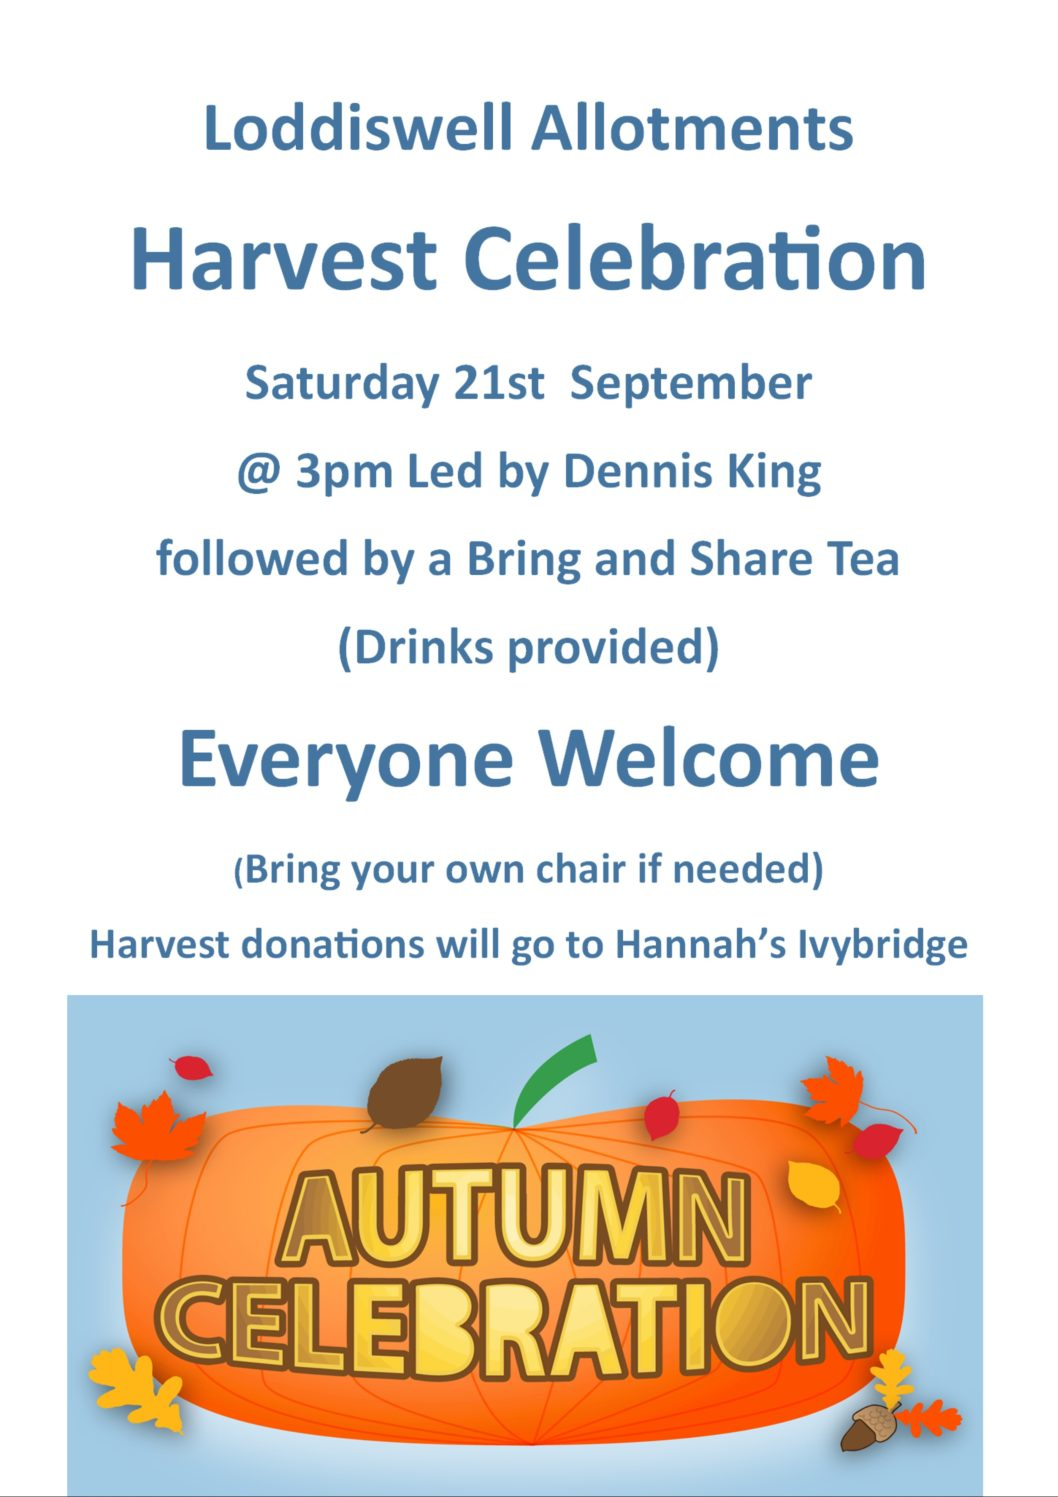 Harvest Celebration - Loddiswell